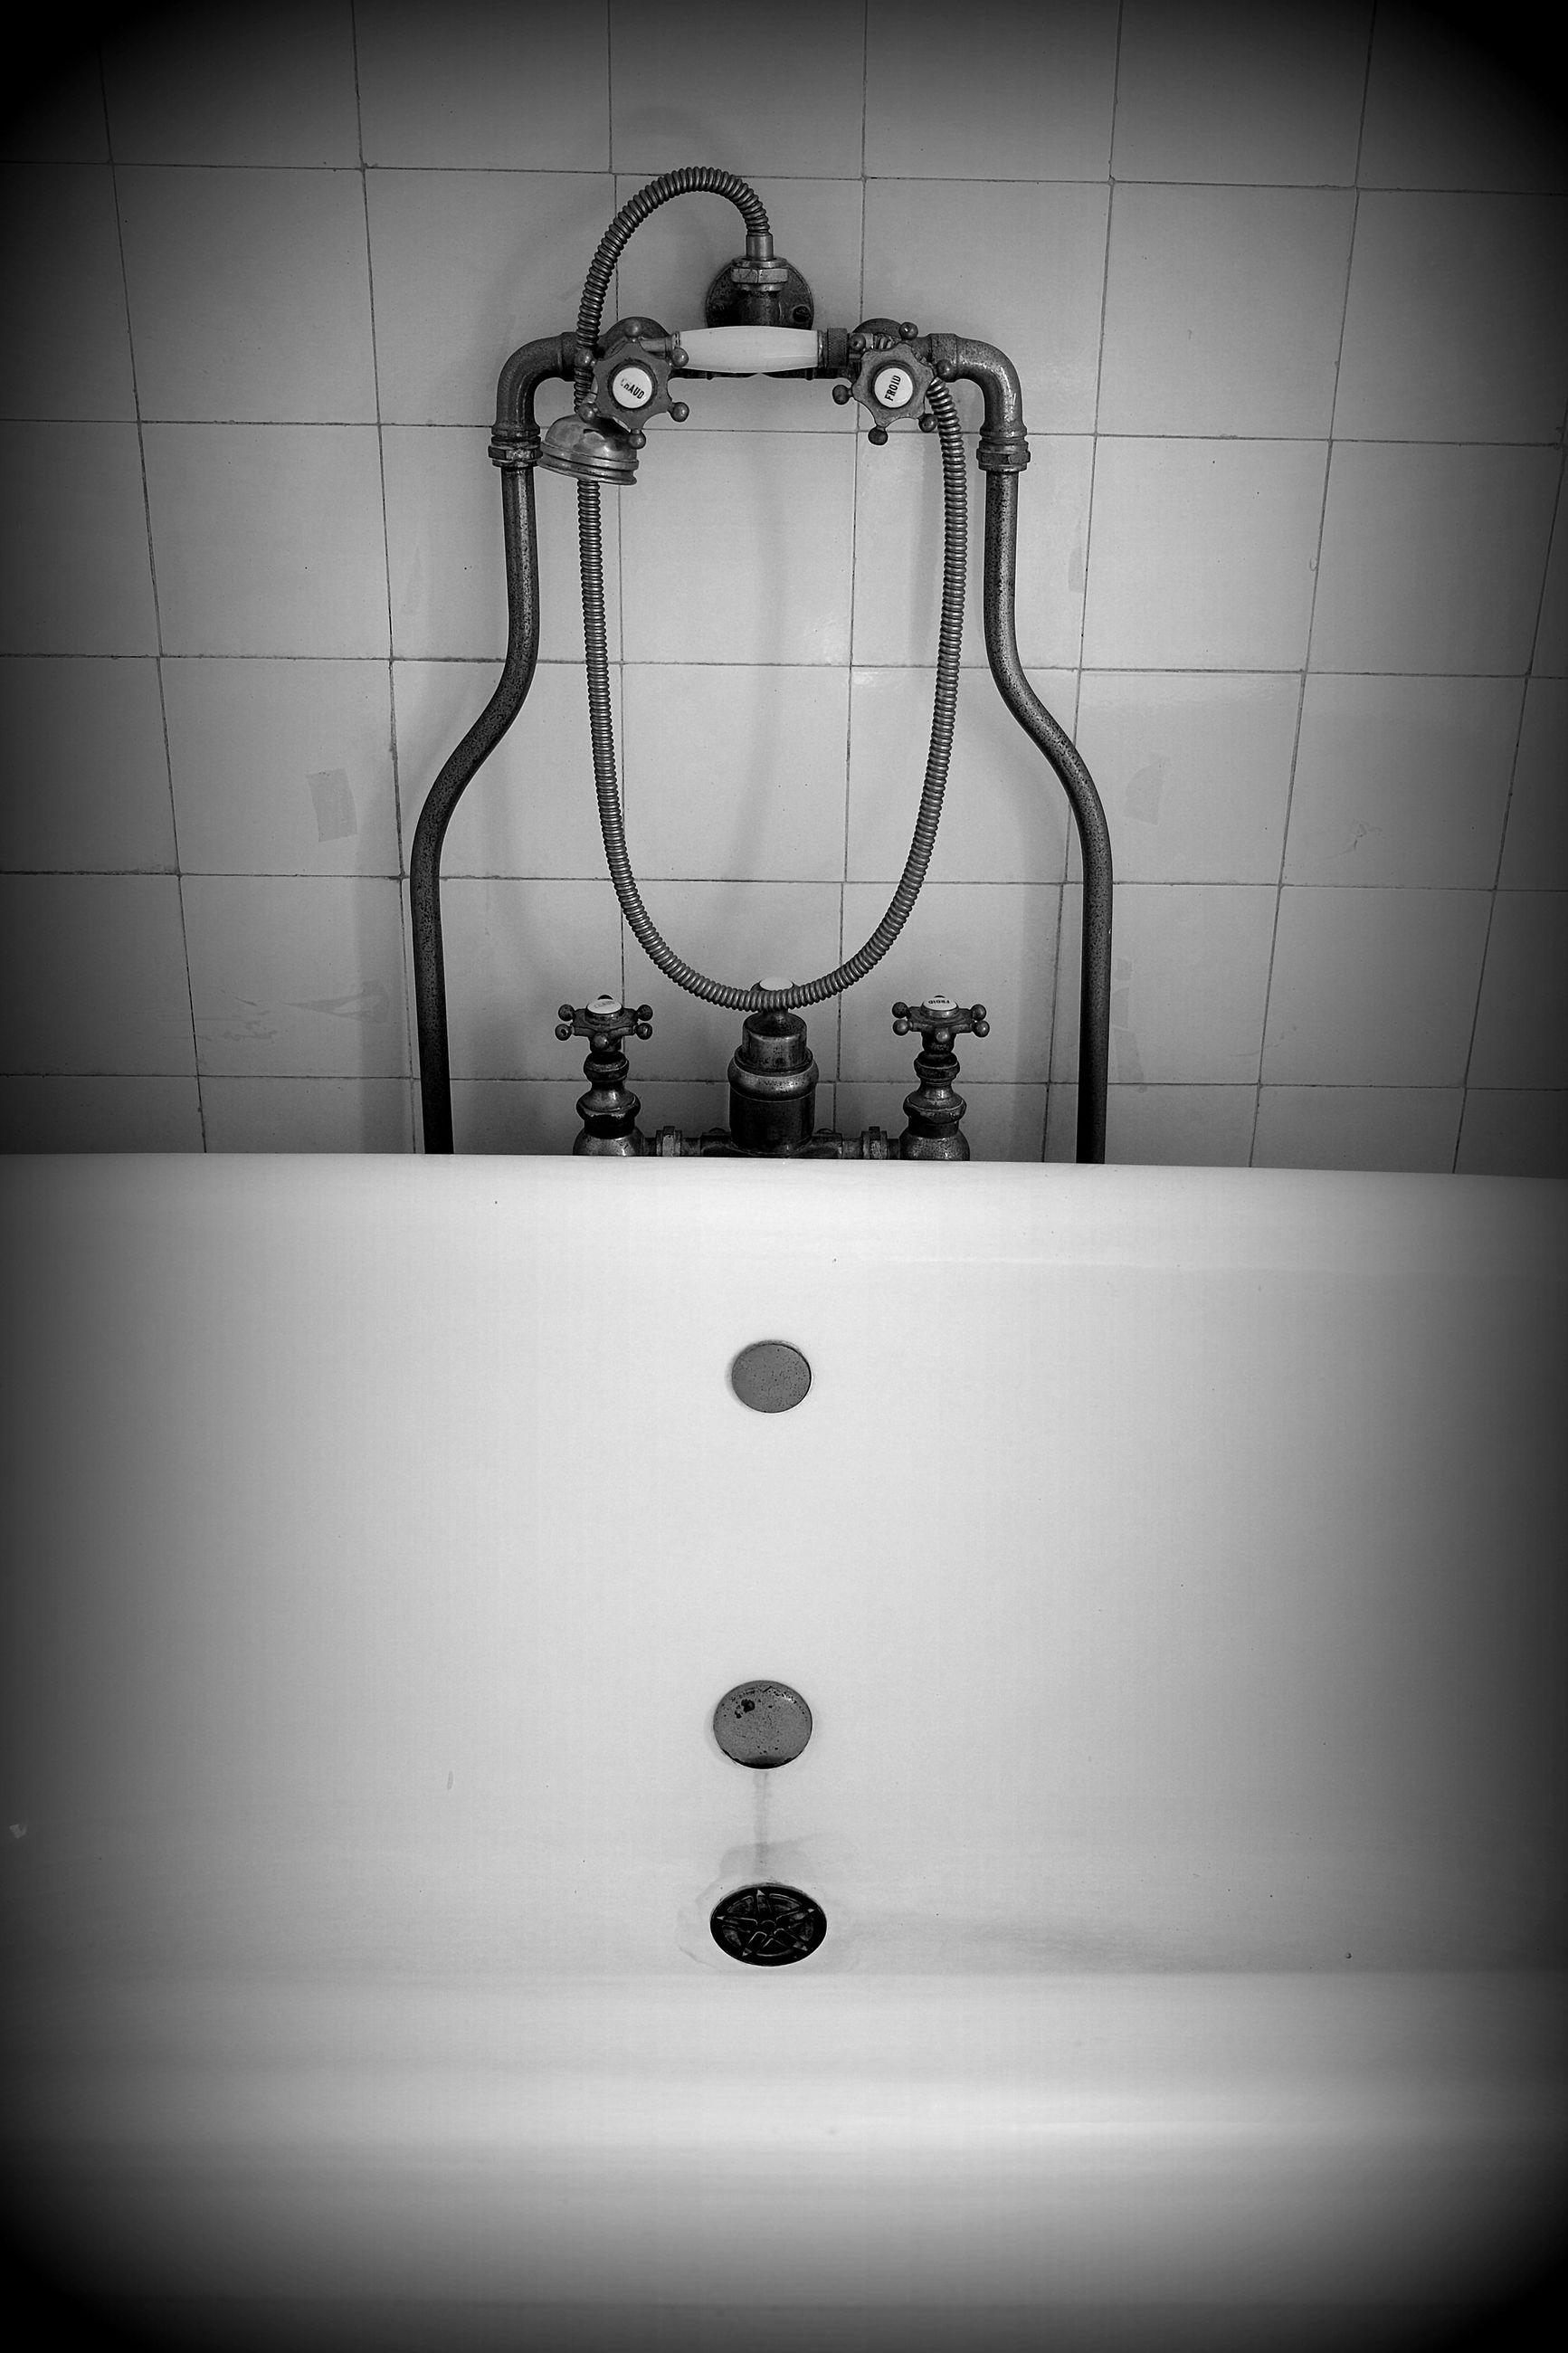 bathroom, domestic bathroom, indoors, plumbing fixture, black and white, tap, sink, domestic room, home, white, faucet, hygiene, monochrome, no people, bidet, monochrome photography, household equipment, shower, tile, vignette, black, flooring